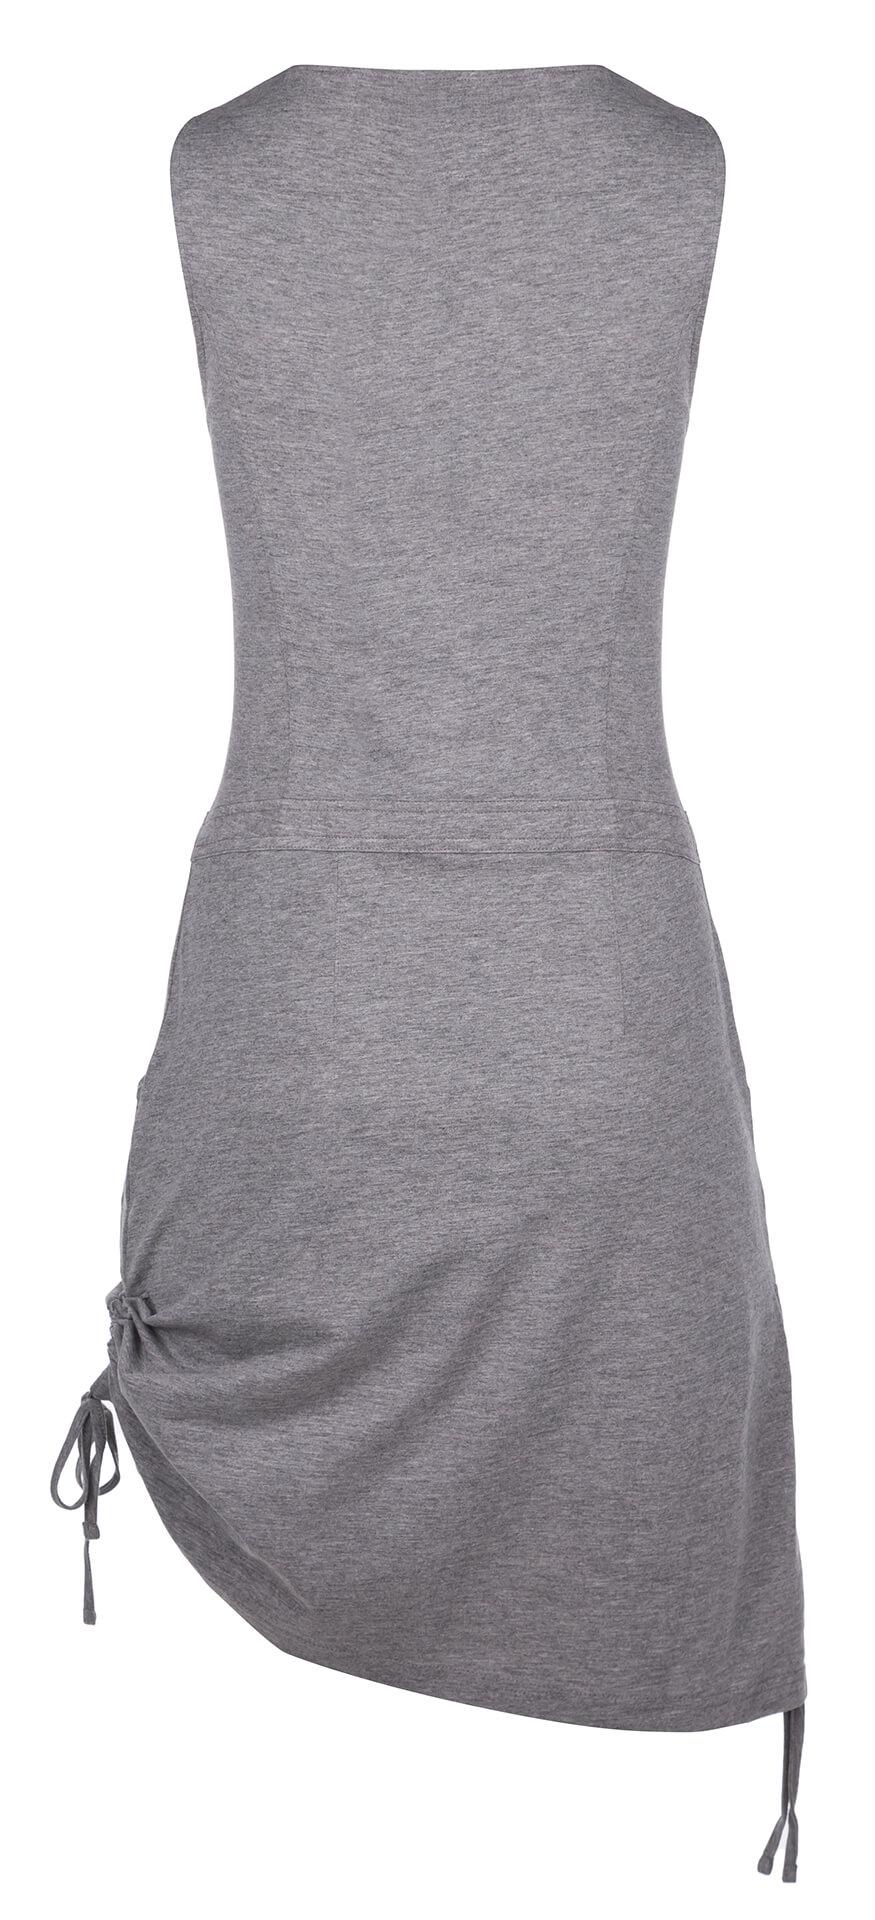 LOAP Dámské šaty Nela Dk Melange CLW1890-T49X  024f7f90da